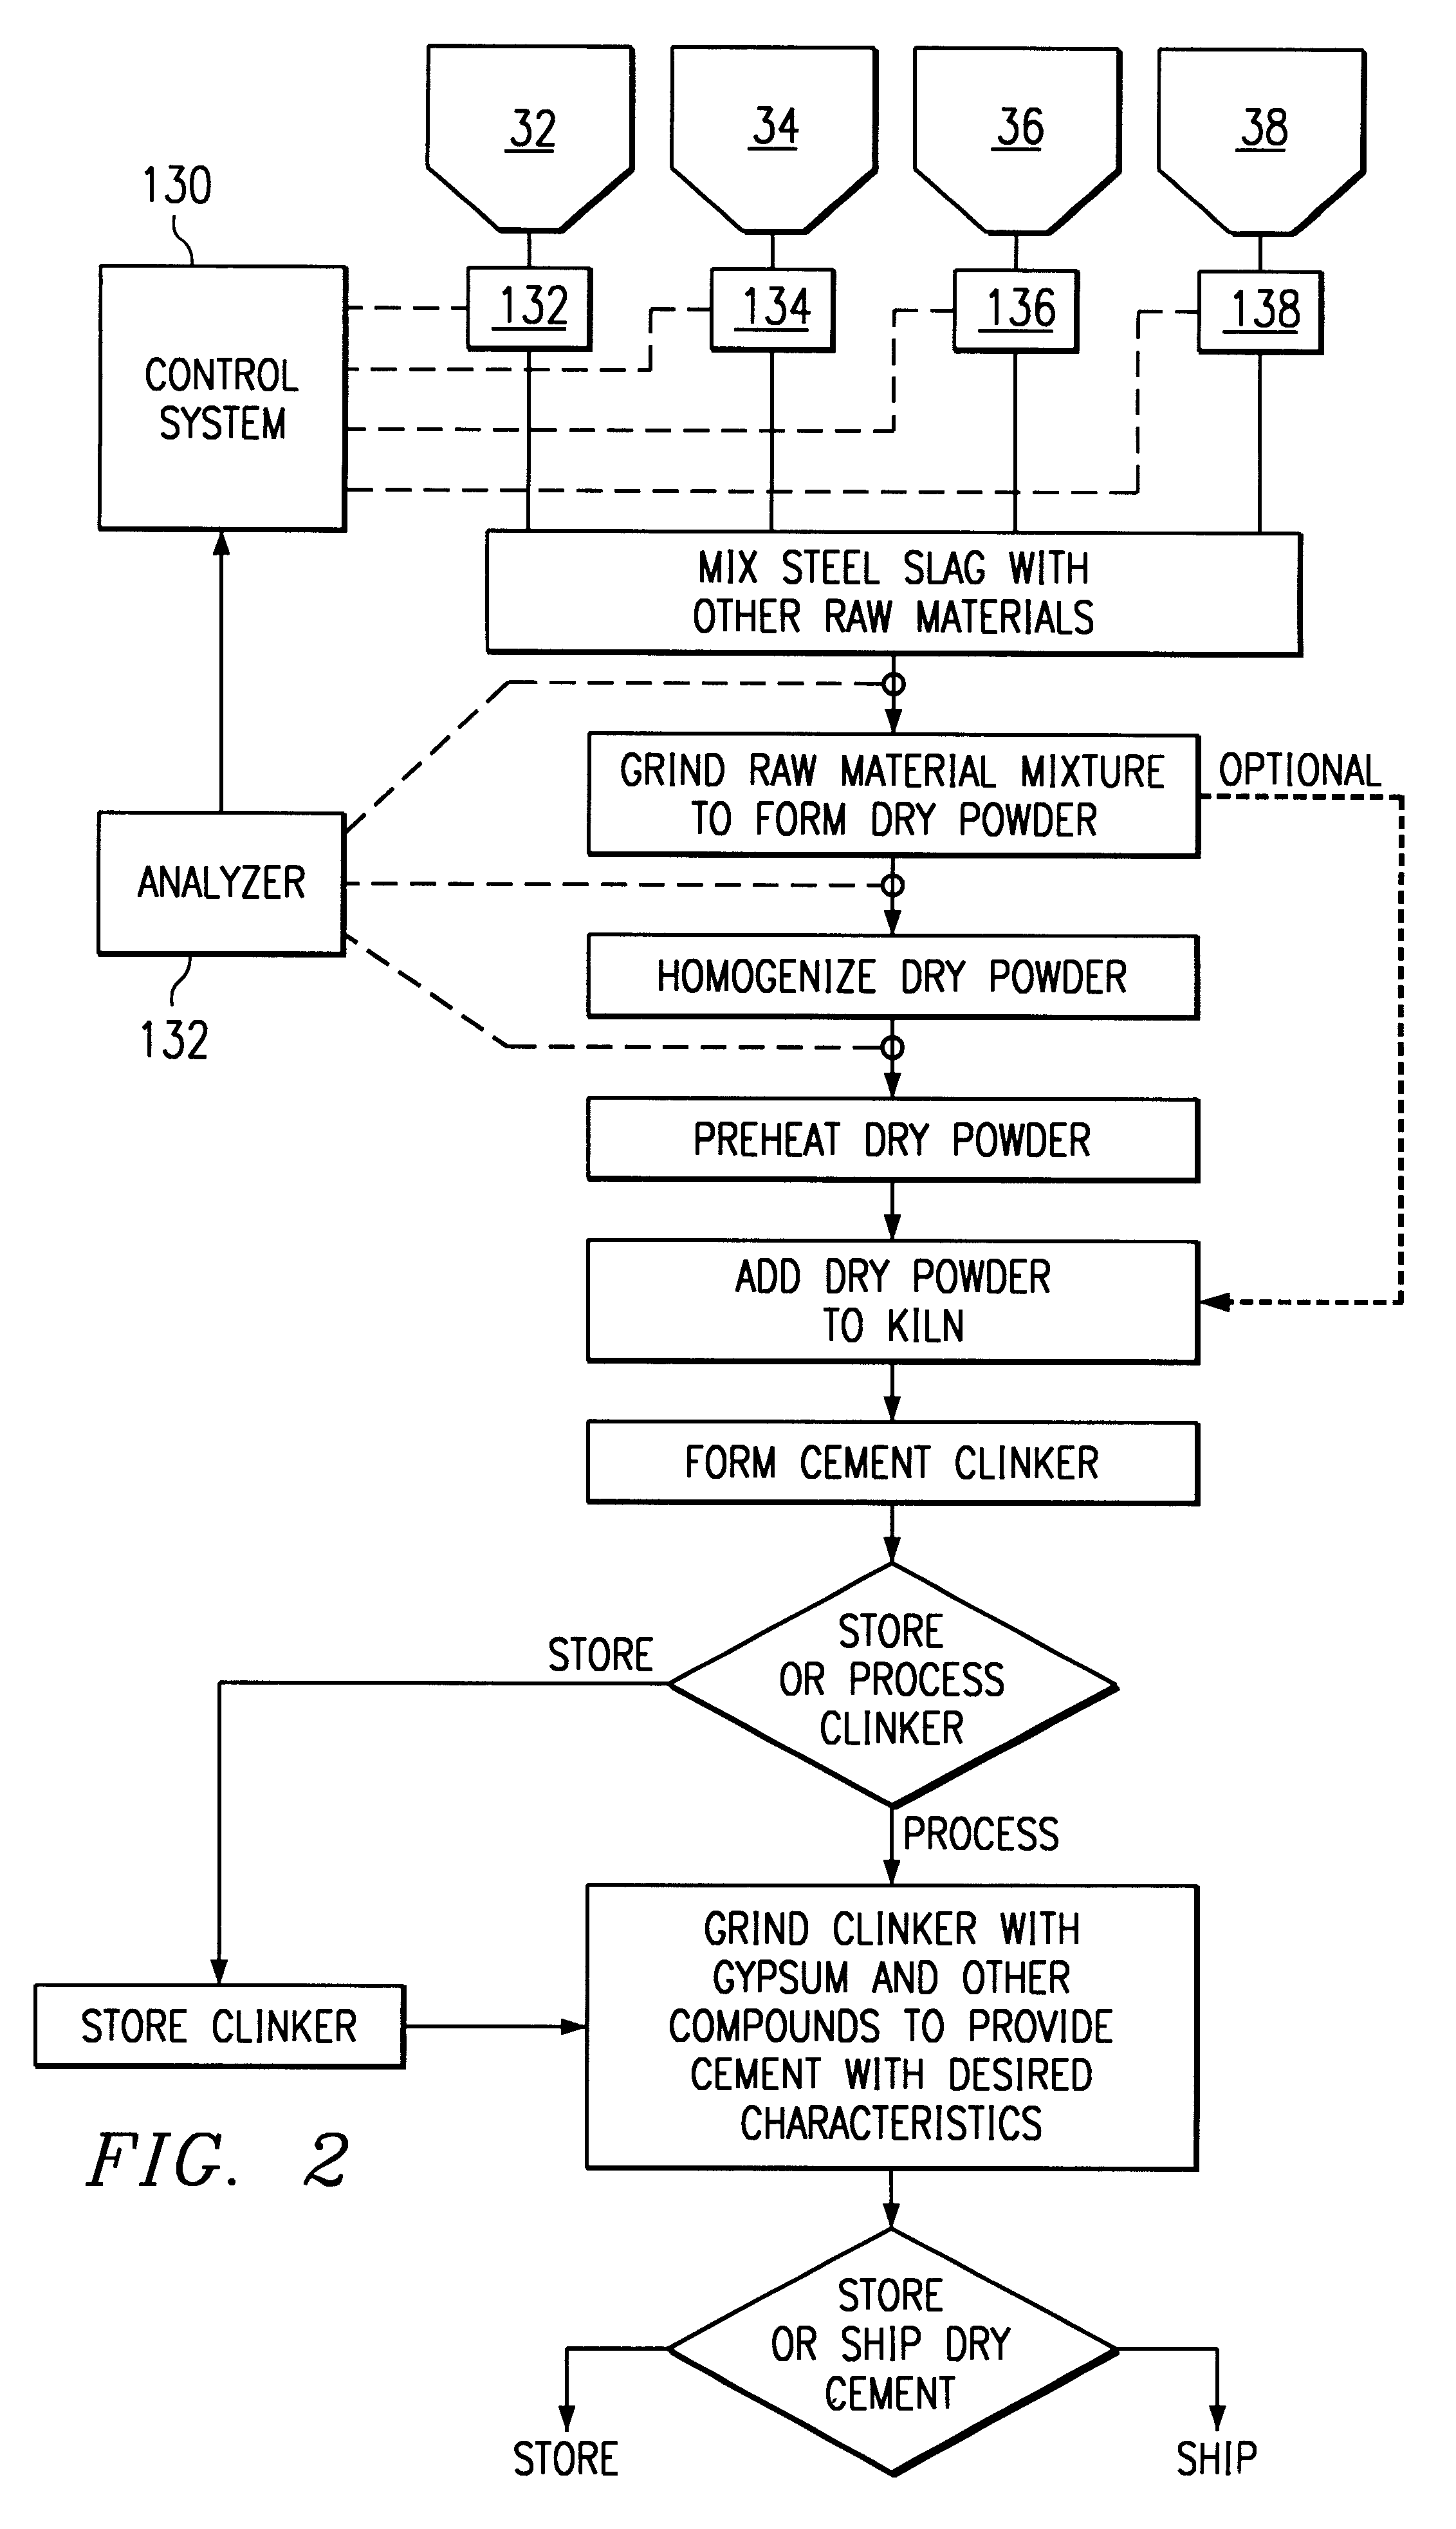 Cement Plant Flow : Flow diagram of dry process cement manufacturing image